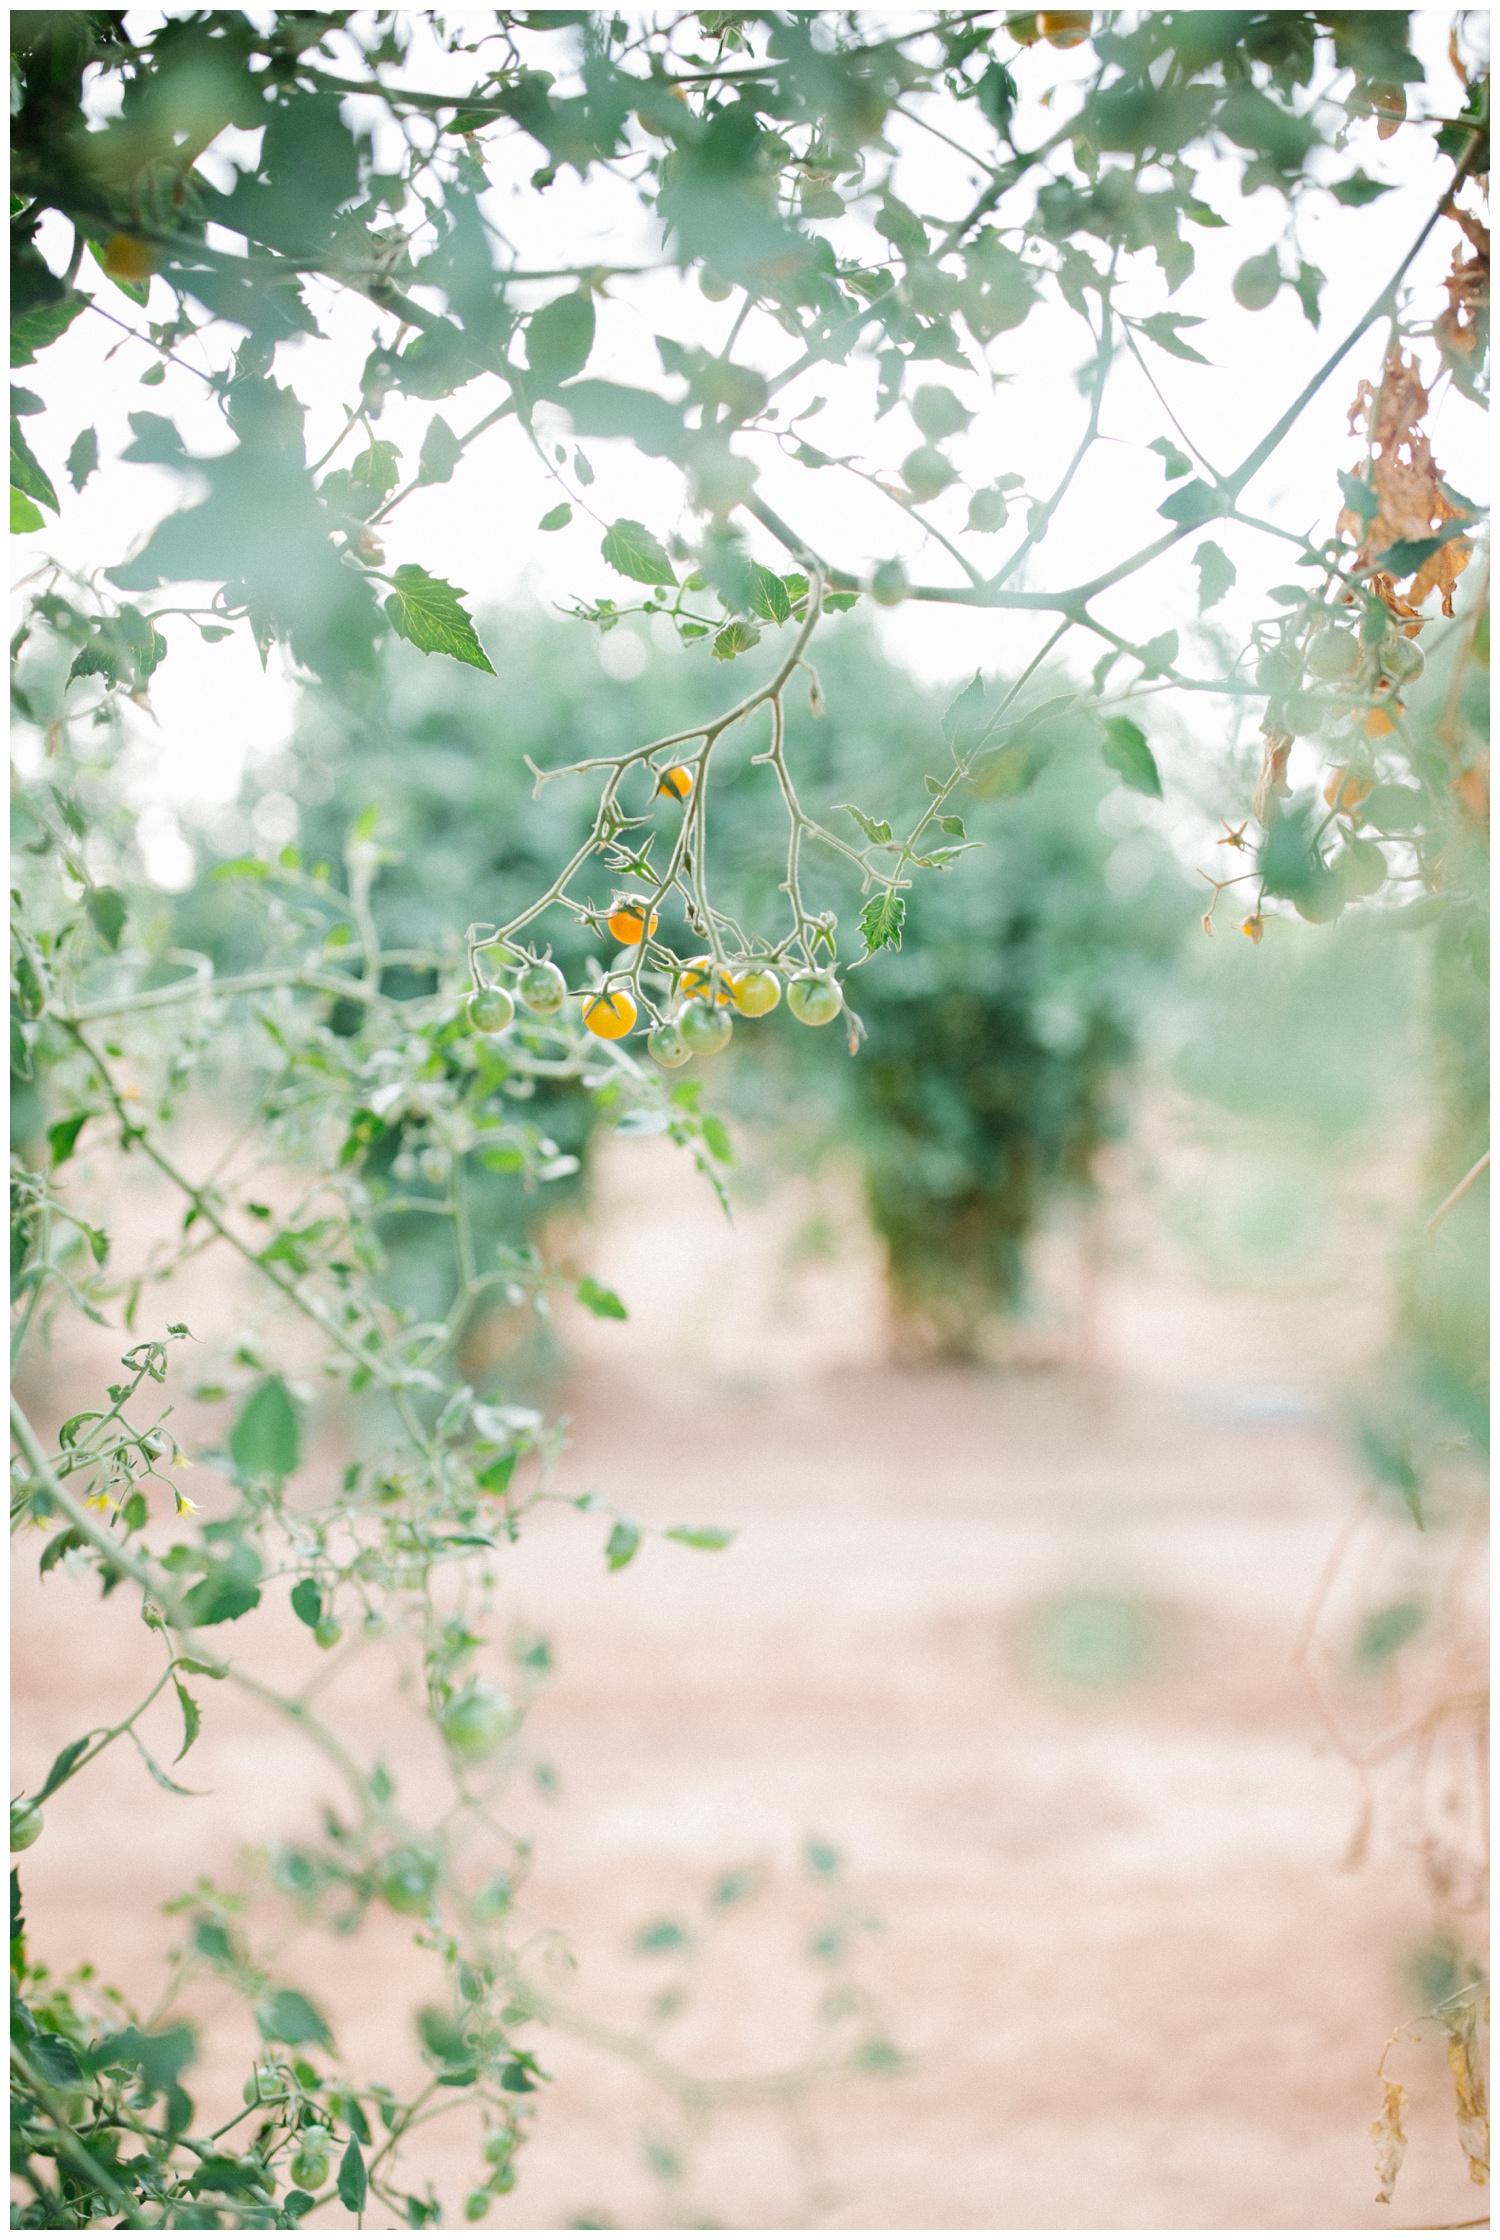 Reimer Farms__Lubbock Texas produce garden_28.jpg